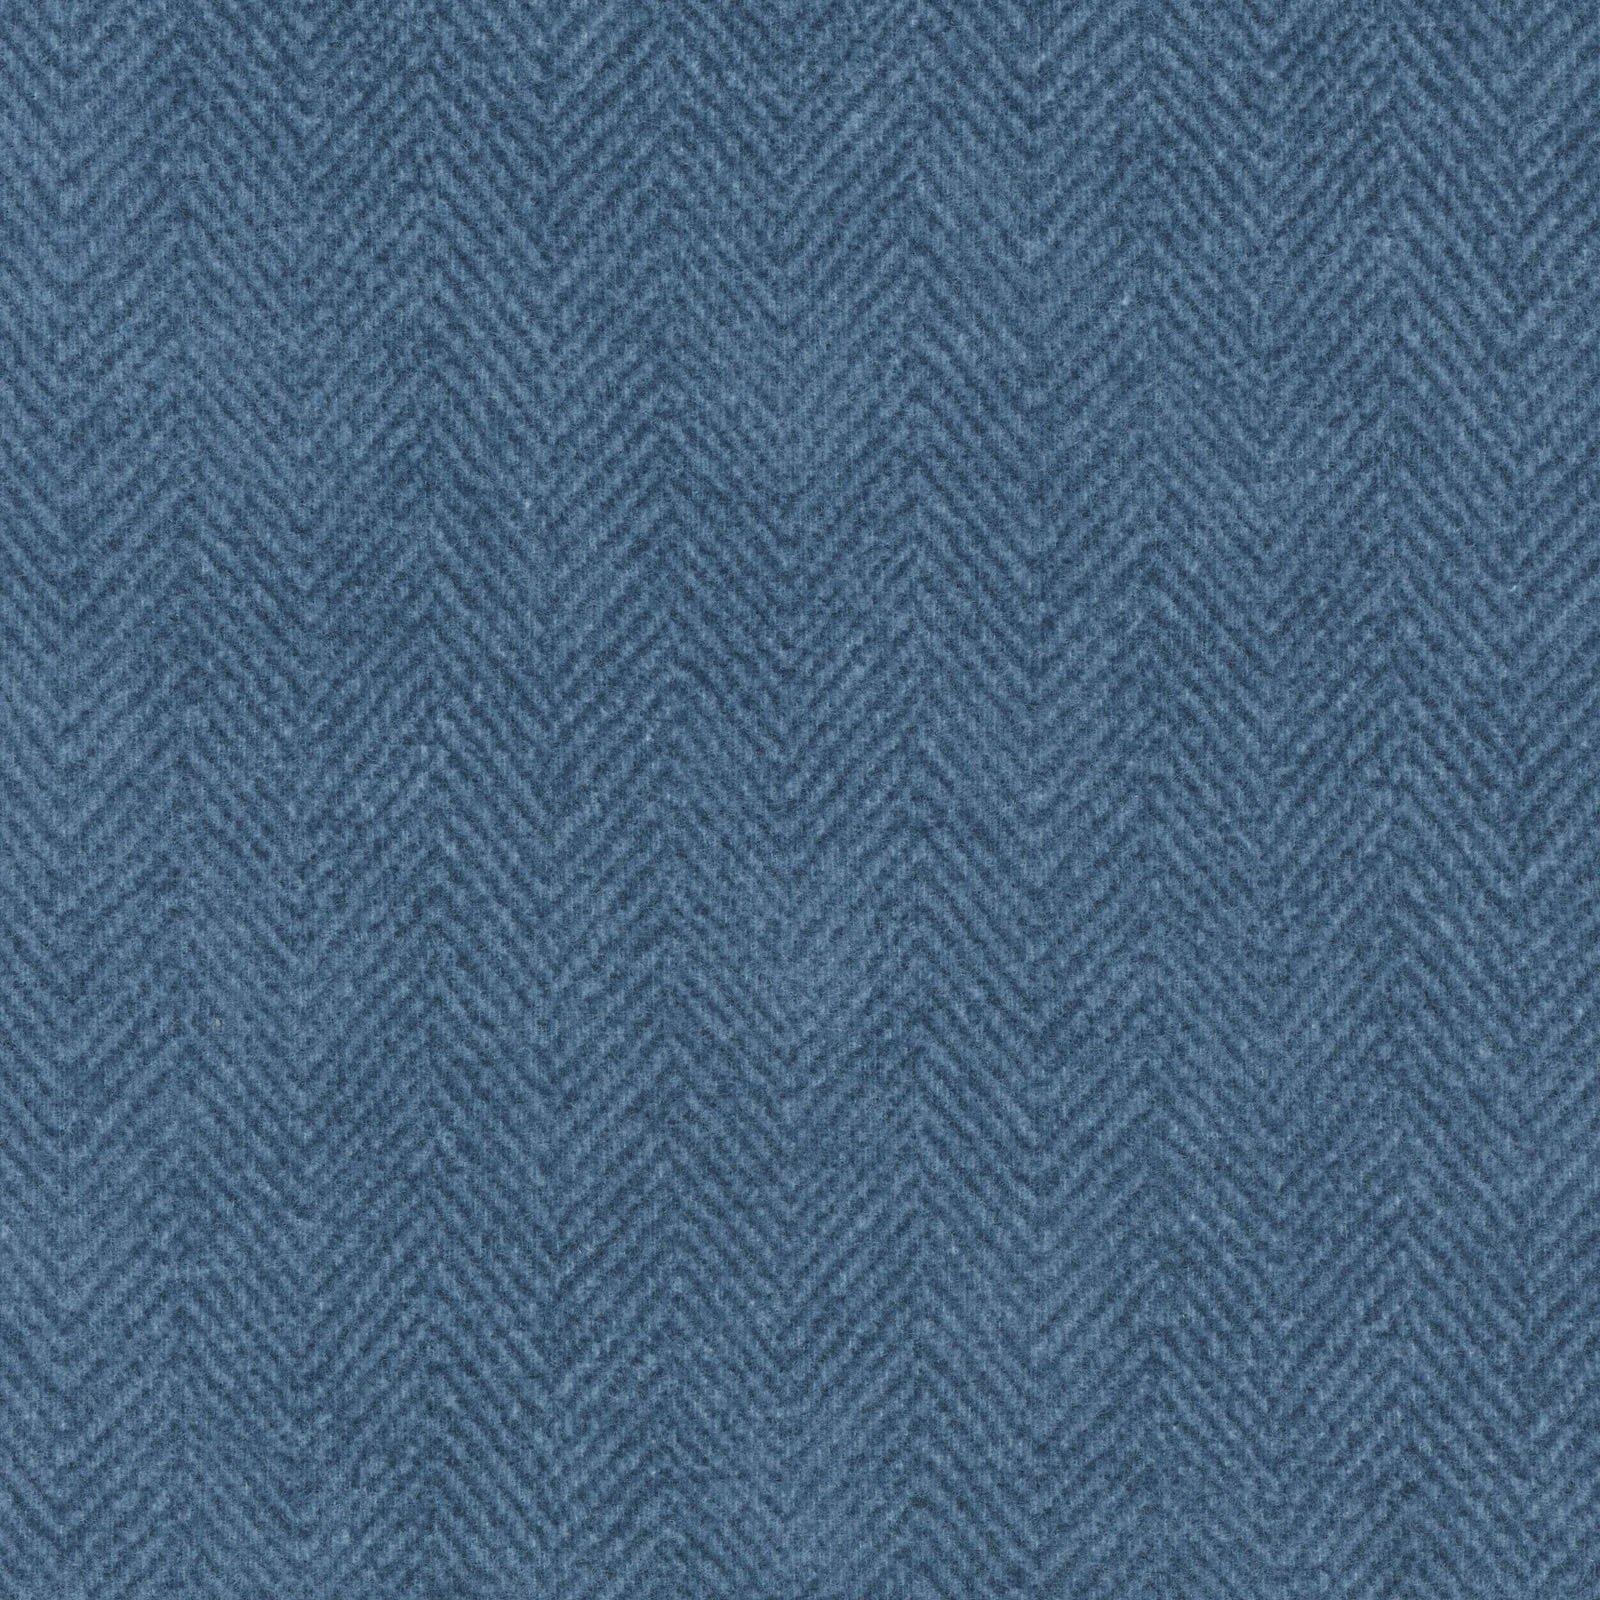 Woolies Flannel 1841-B3